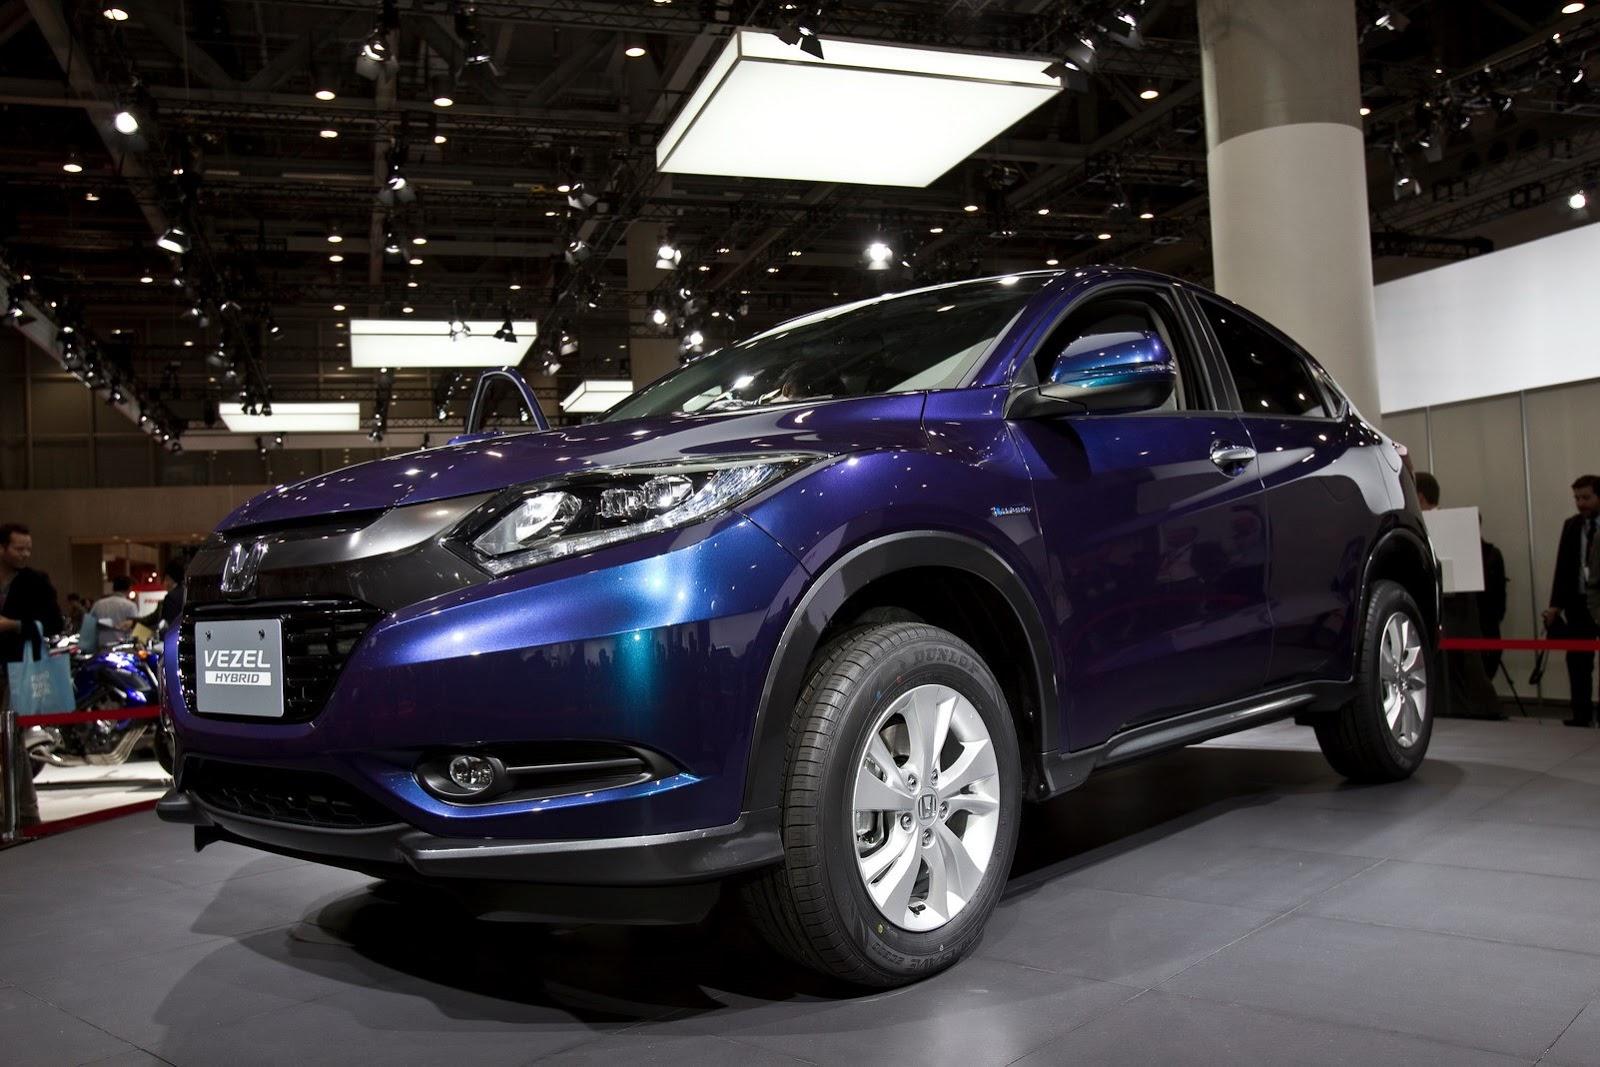 Honda เตรียมตีตลาดรถบ้านเกิดด้วยเจ้า Quot Vezel Quot Suv คันเล็ก